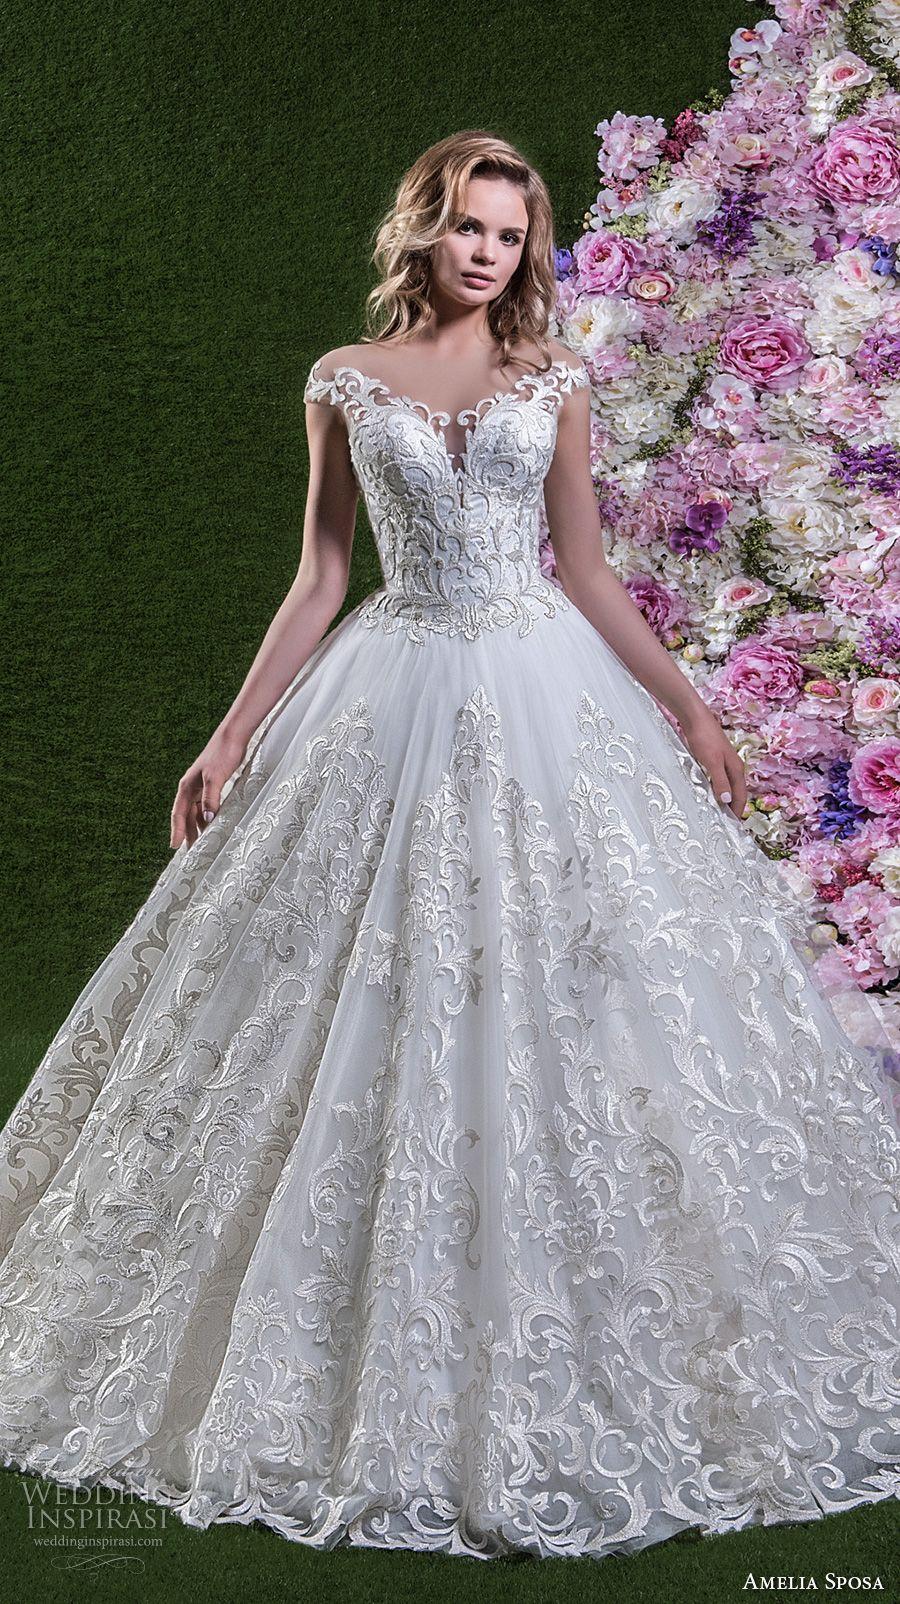 Wedding dresses springfield mo  Amelia Sposa  Wedding Dresses  weddings  Pinterest  Amelia